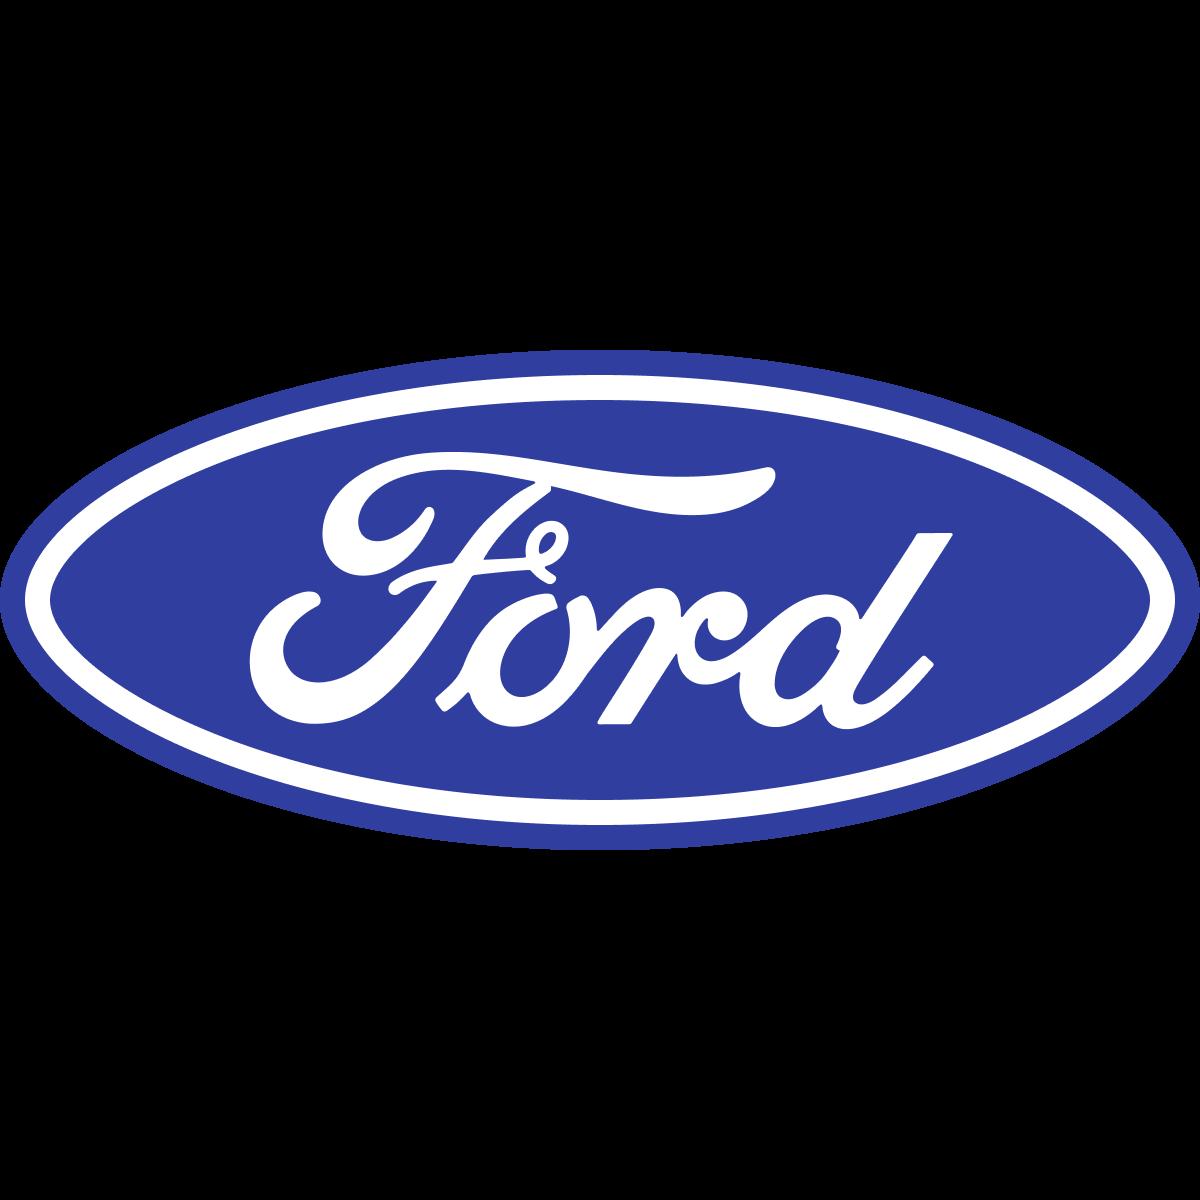 Разборка, Запчасти автомобилей FORD TRANSIT